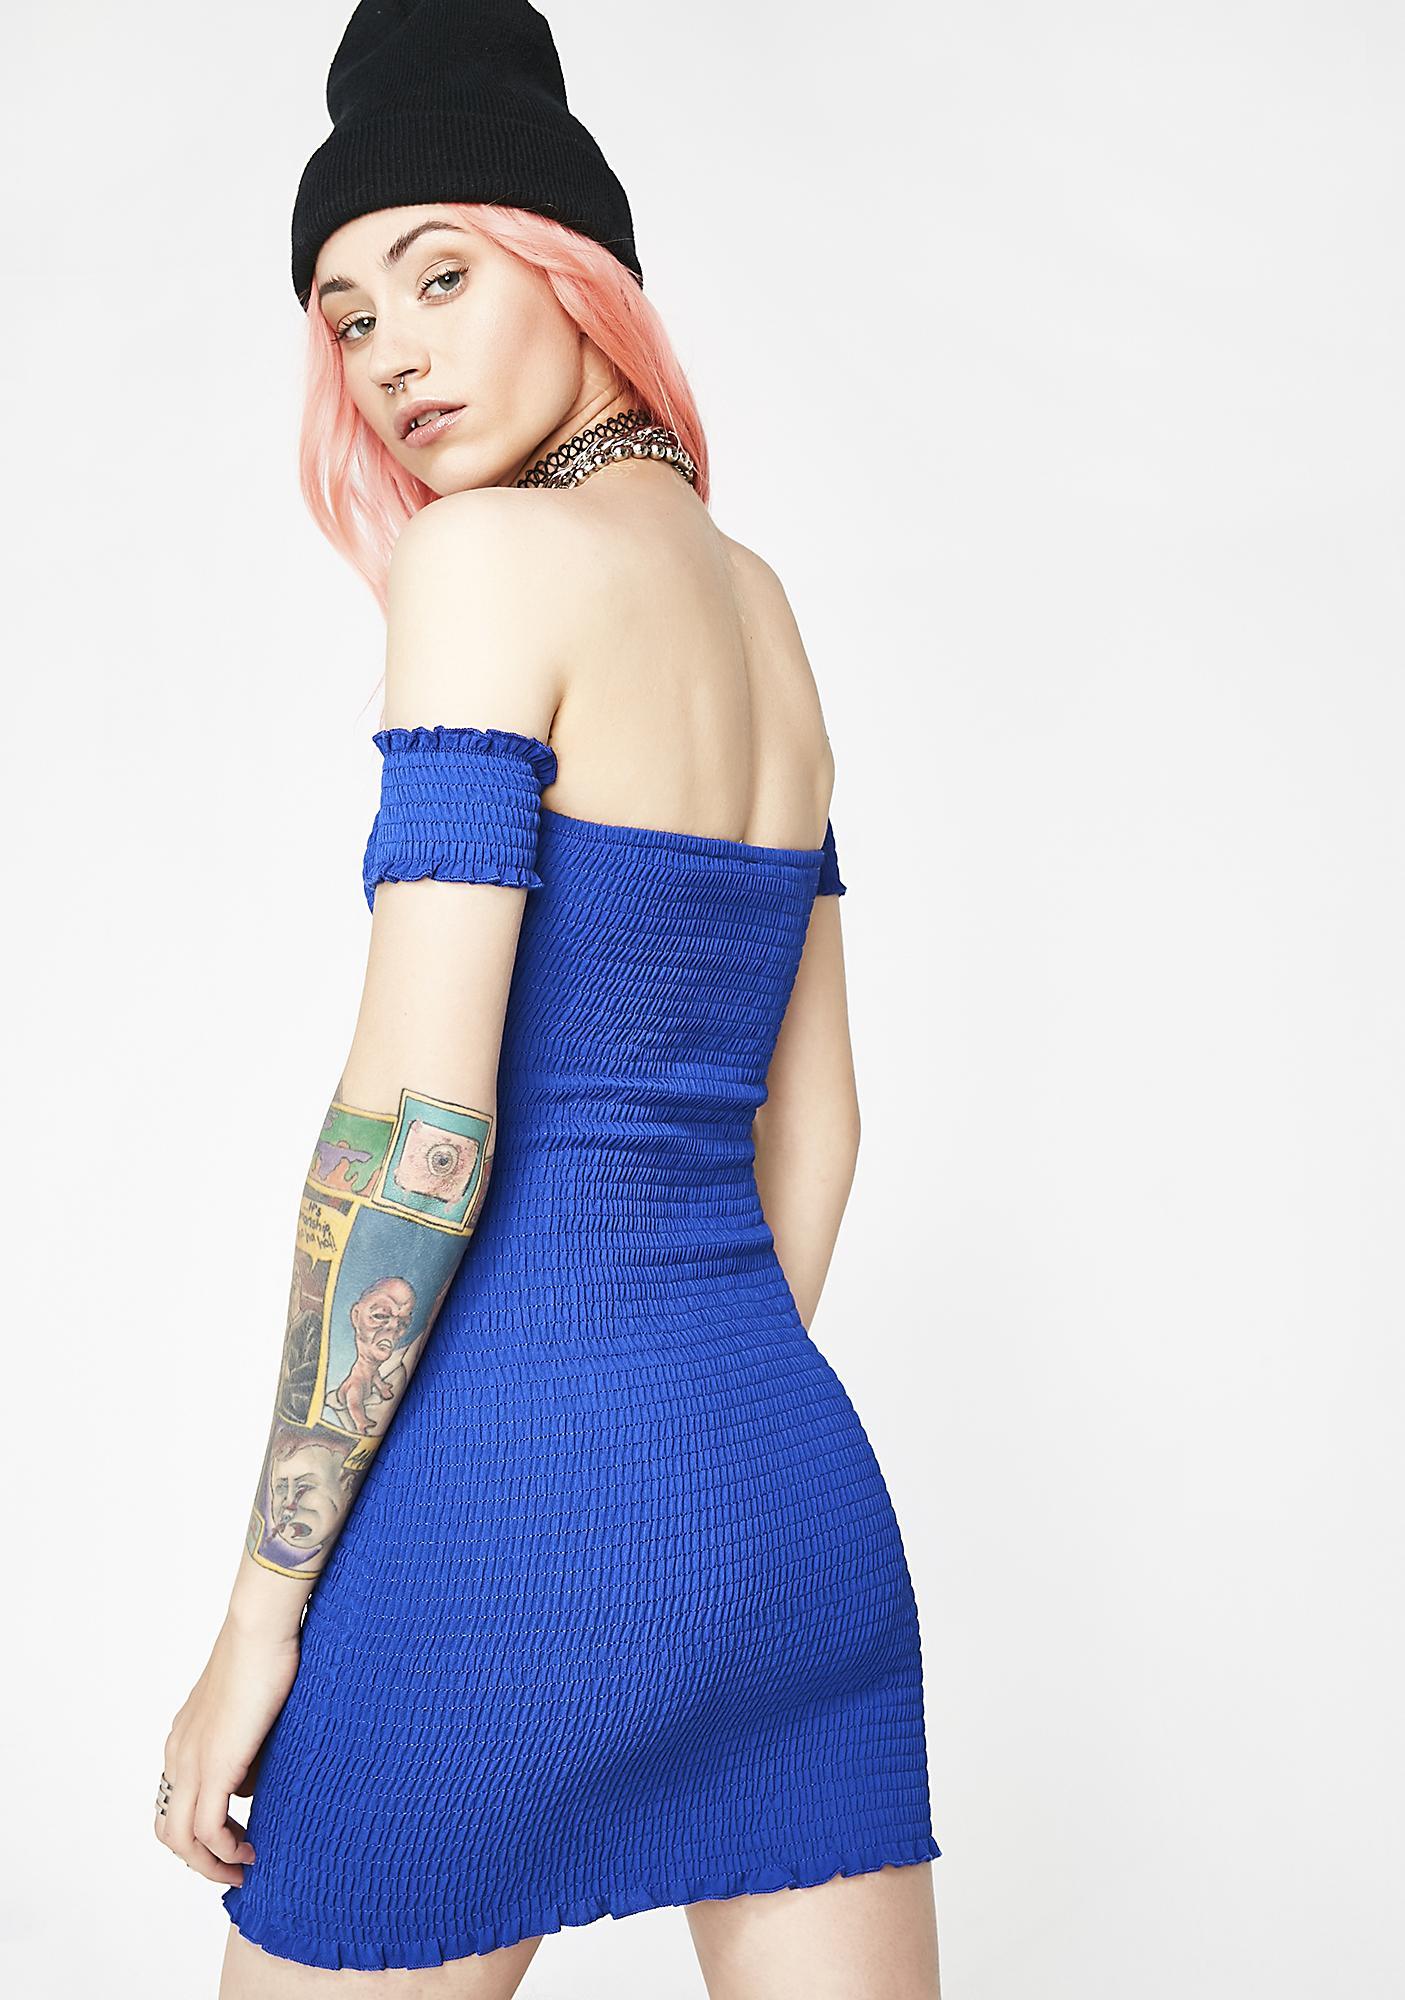 So Needy Off Shoulder Dress